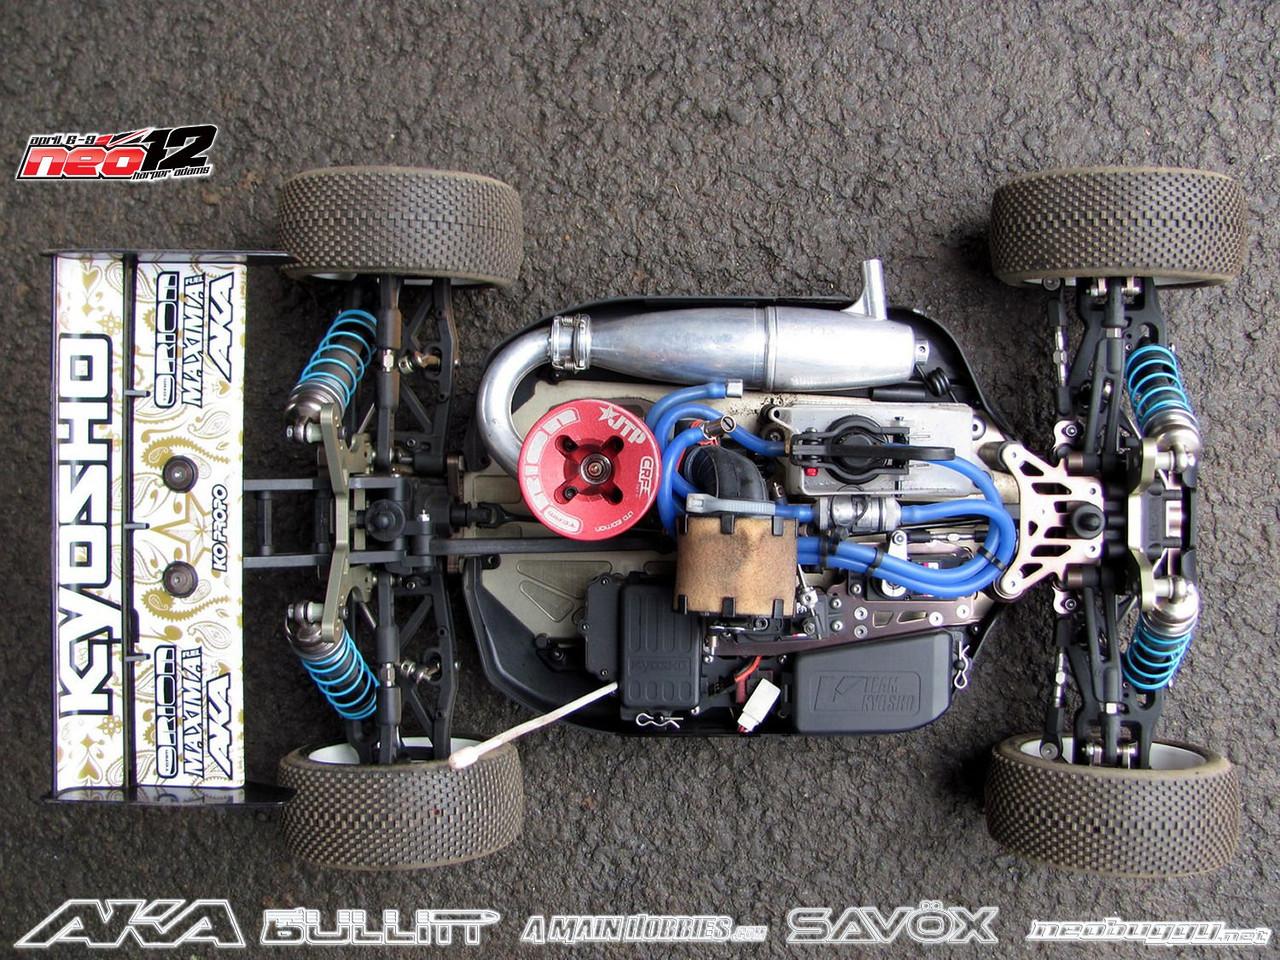 Kyoshosan Kyosho Inferno Mp9 Tki3 Debuts W A Win Pn Racing V2 Rc Printed Circuit Board Assembly Mr03 Setting Thursday 12 April 2012